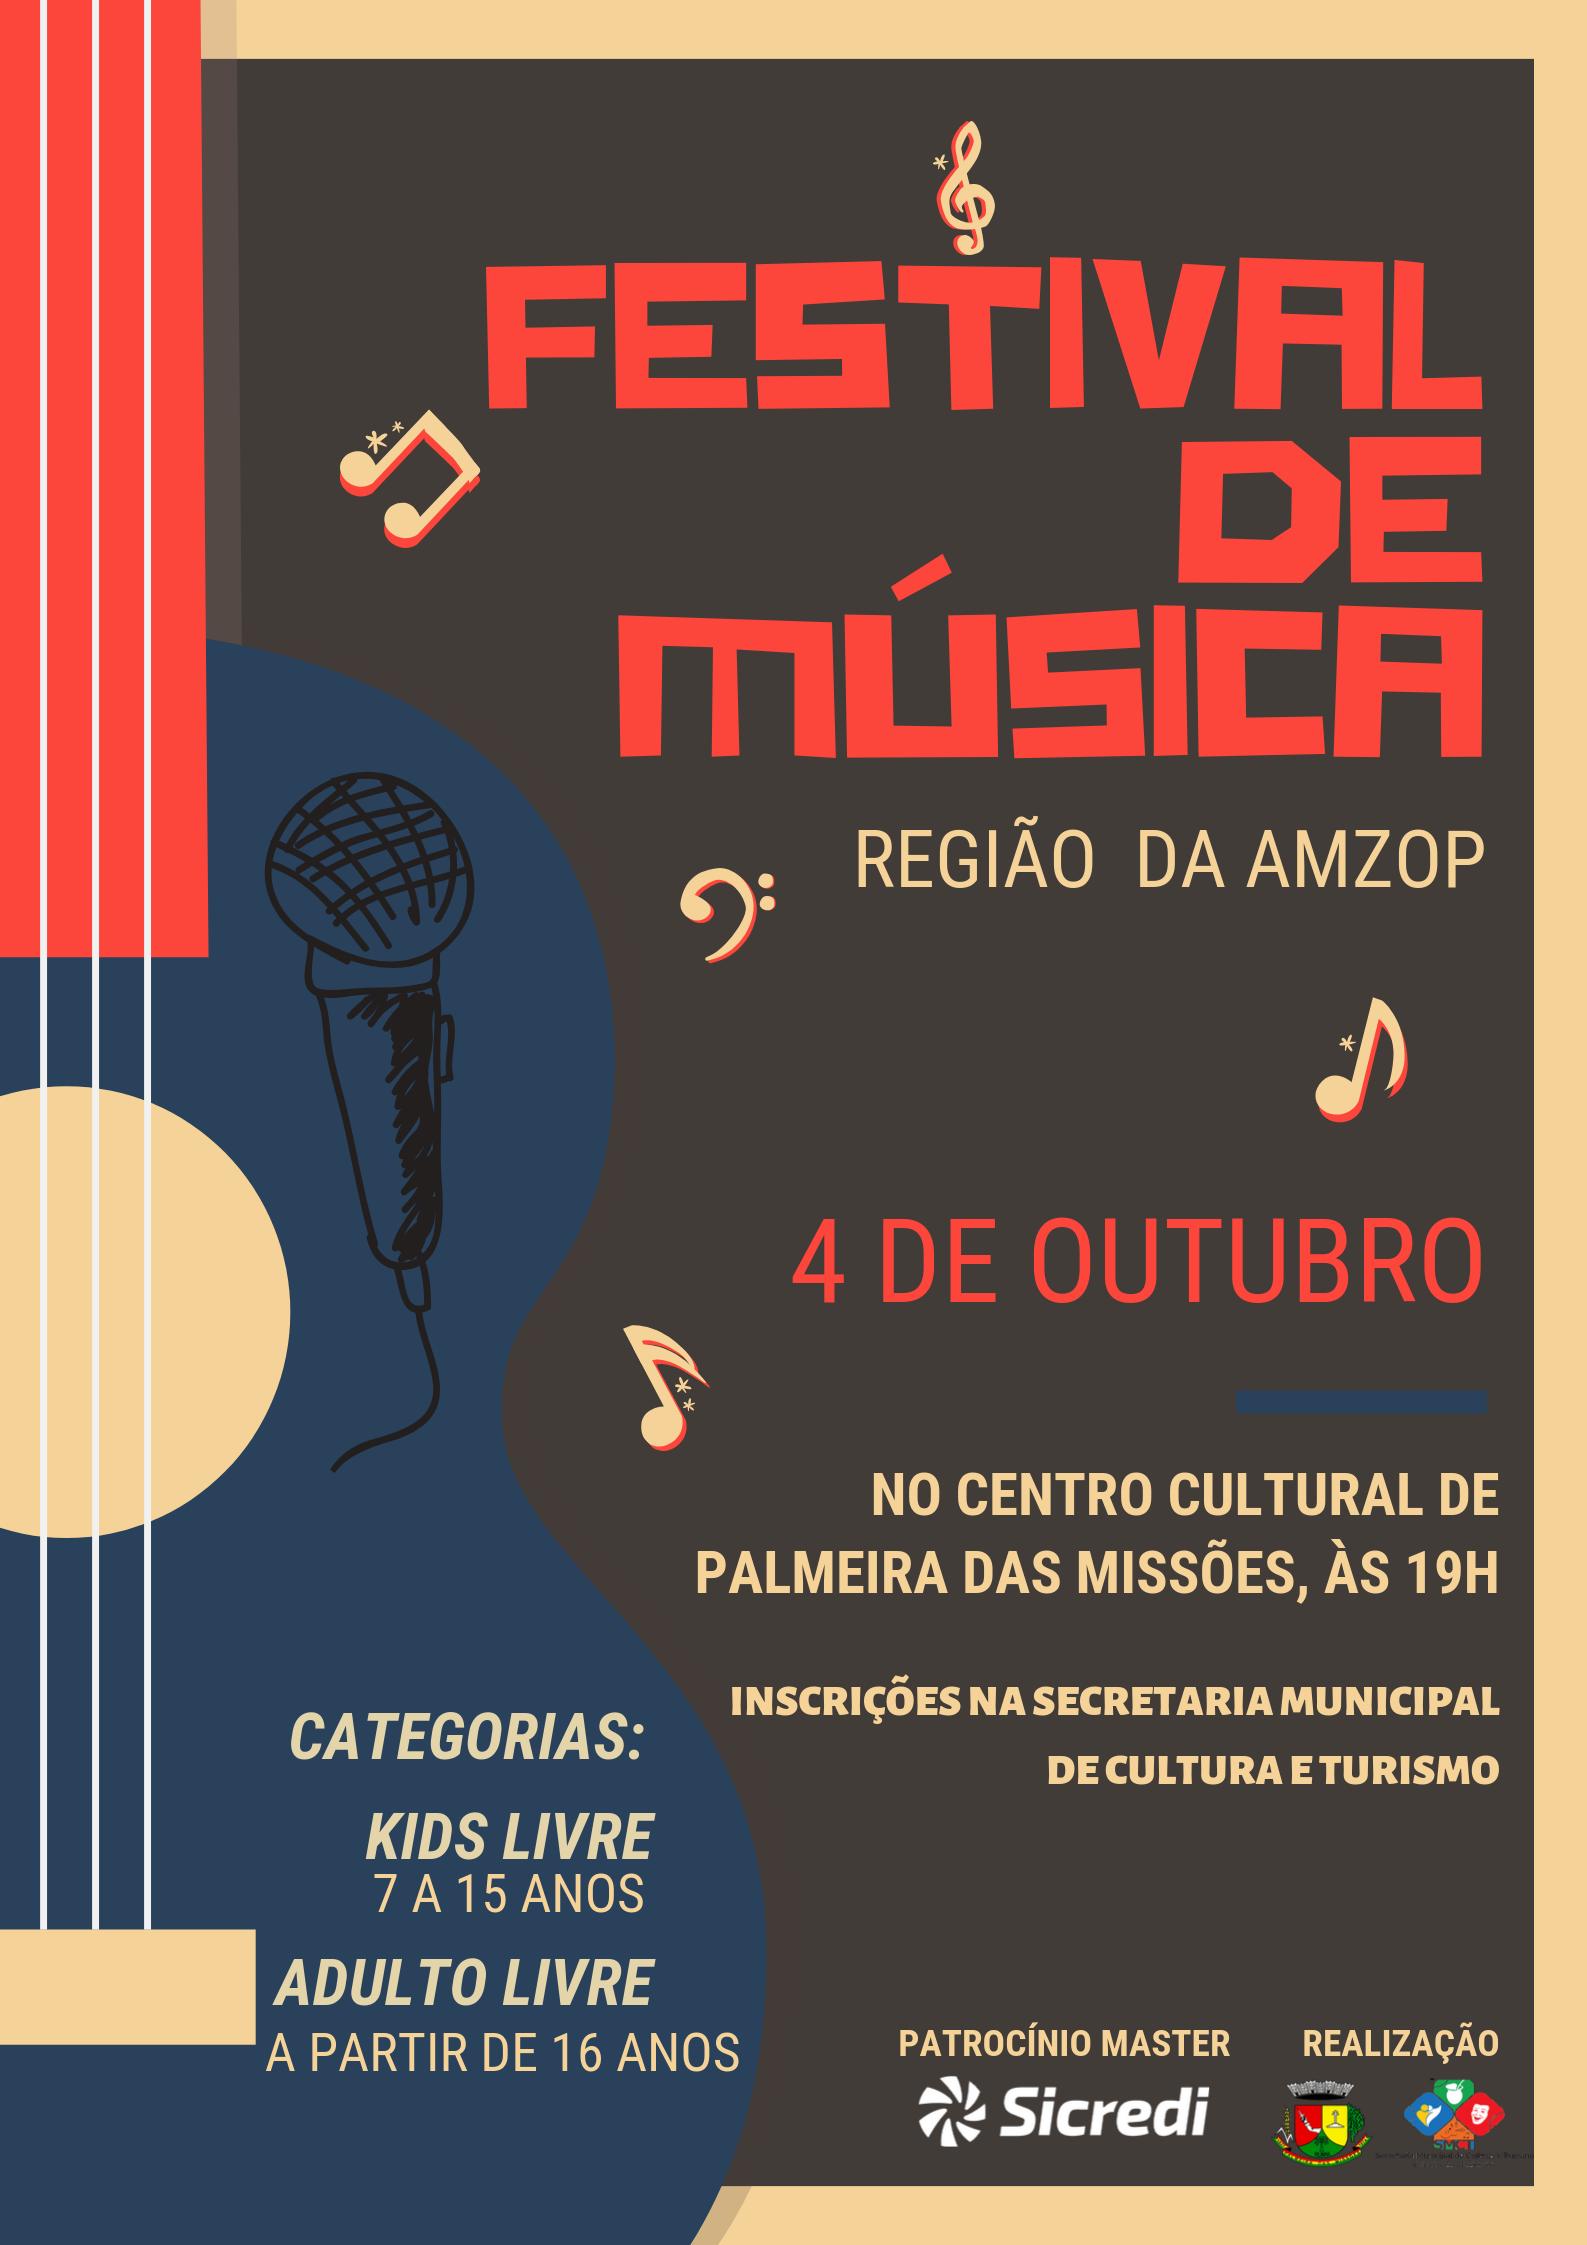 FESTIVAL DE MÚSICA1 (1).png